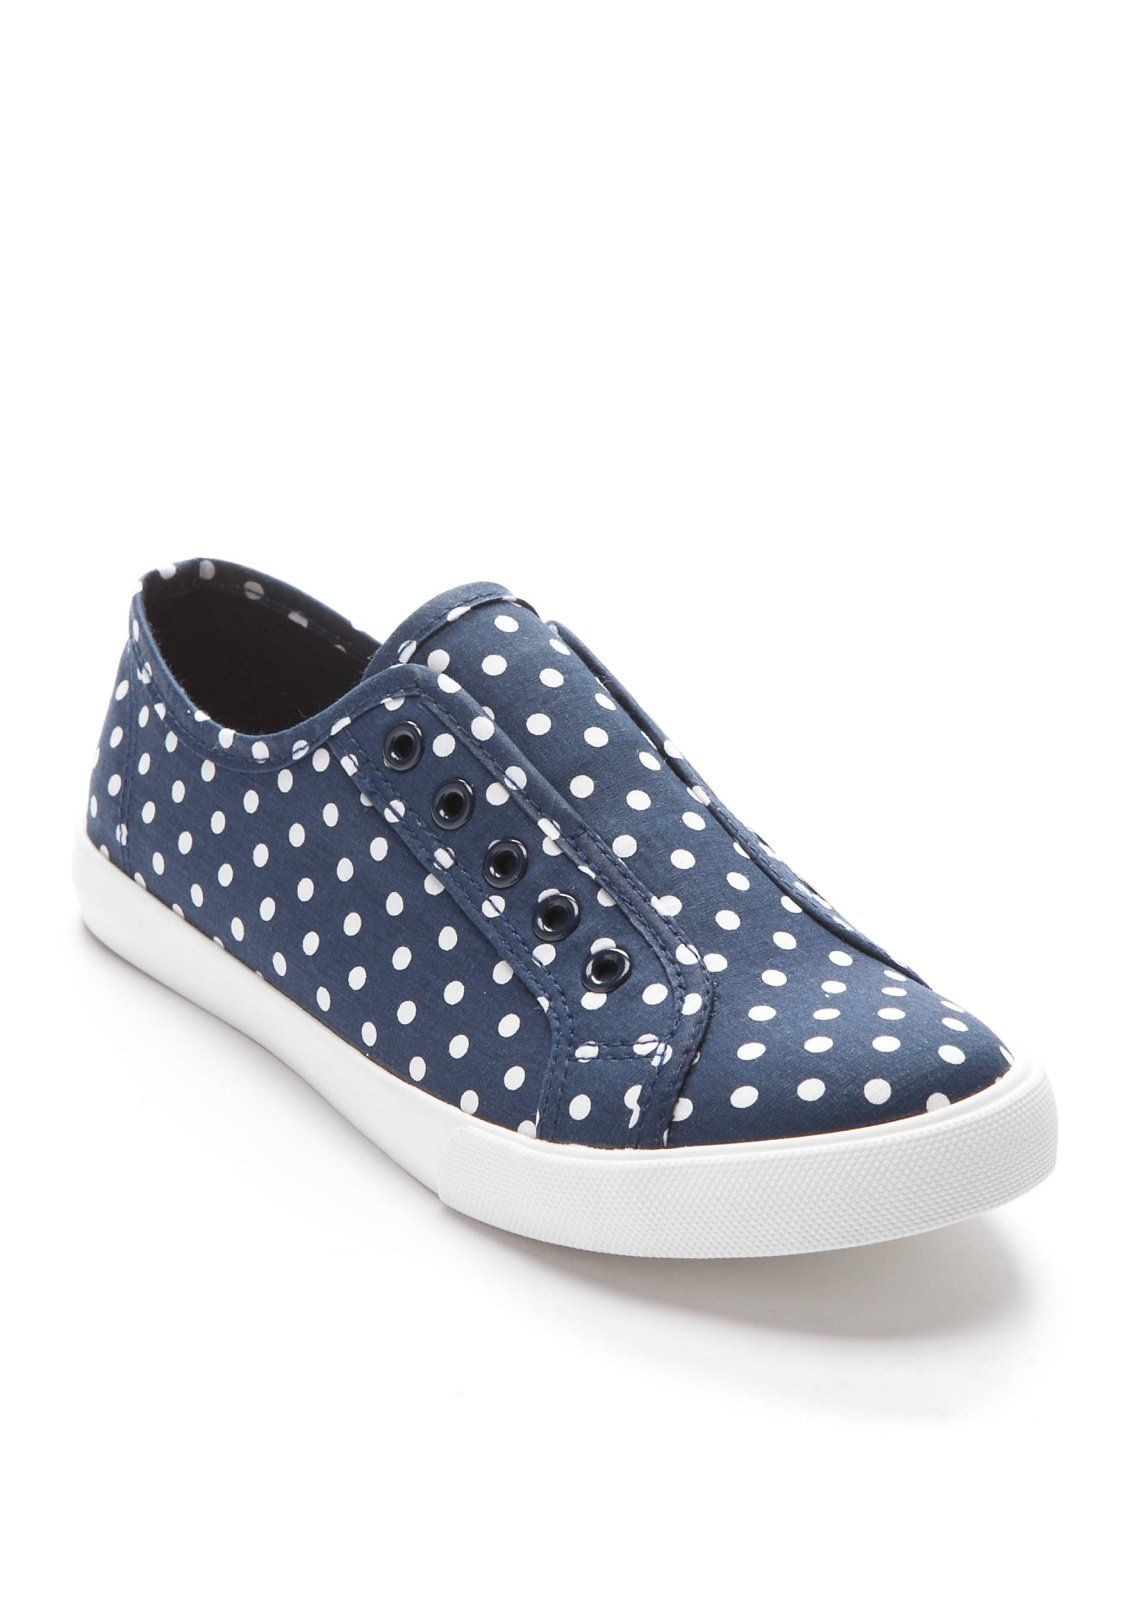 Ivy™ Ciera Laceless Canvas Sneaker